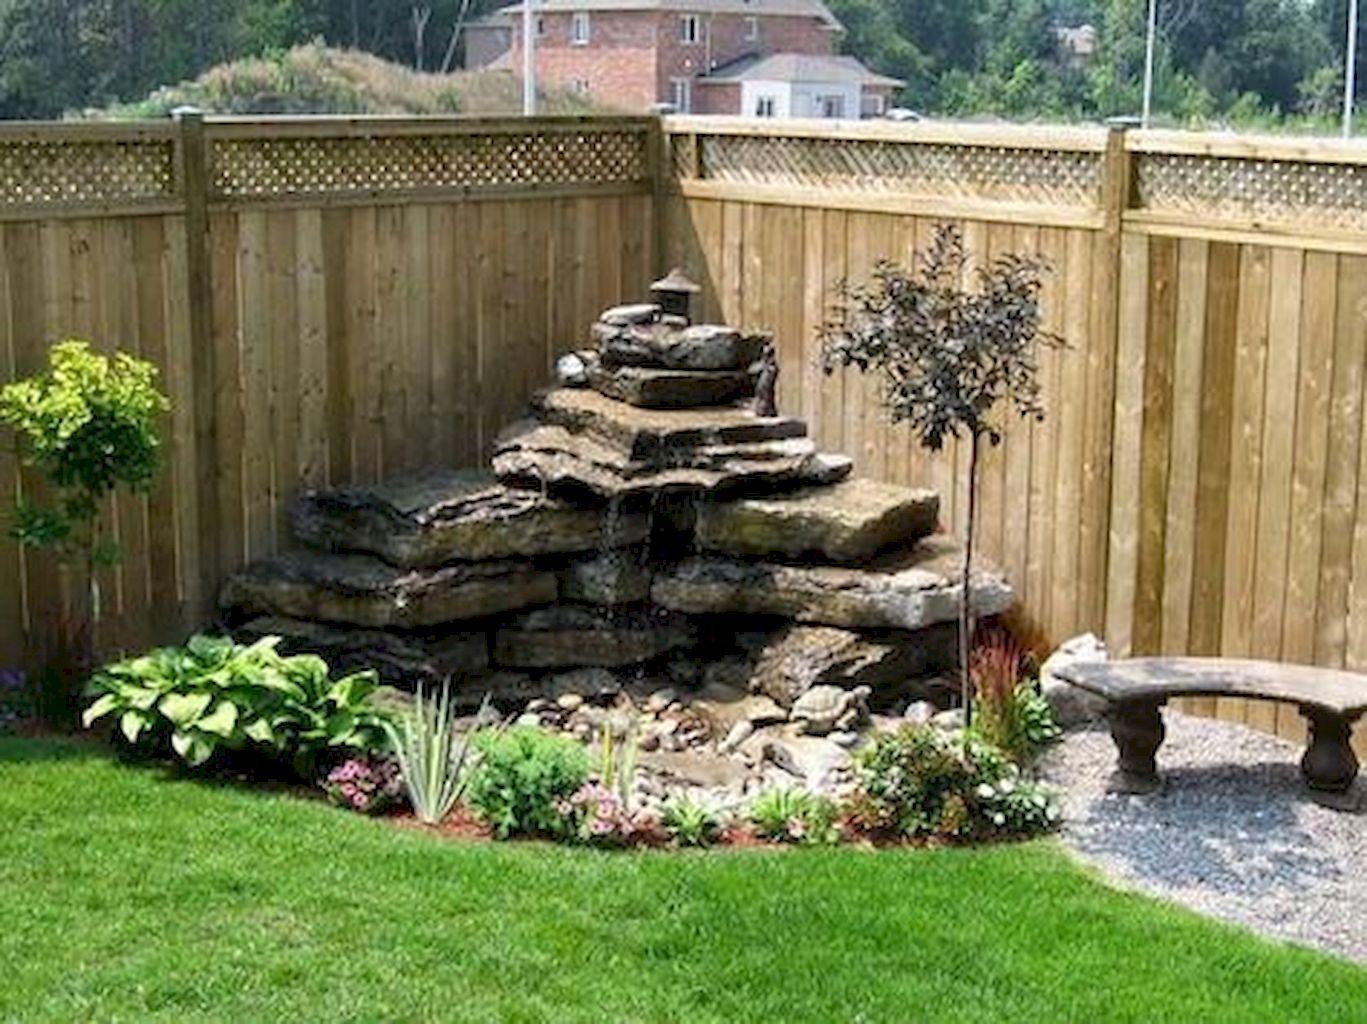 Beautiful Backyard Ponds And Waterfalls Garden Ideas 73 640 x 480